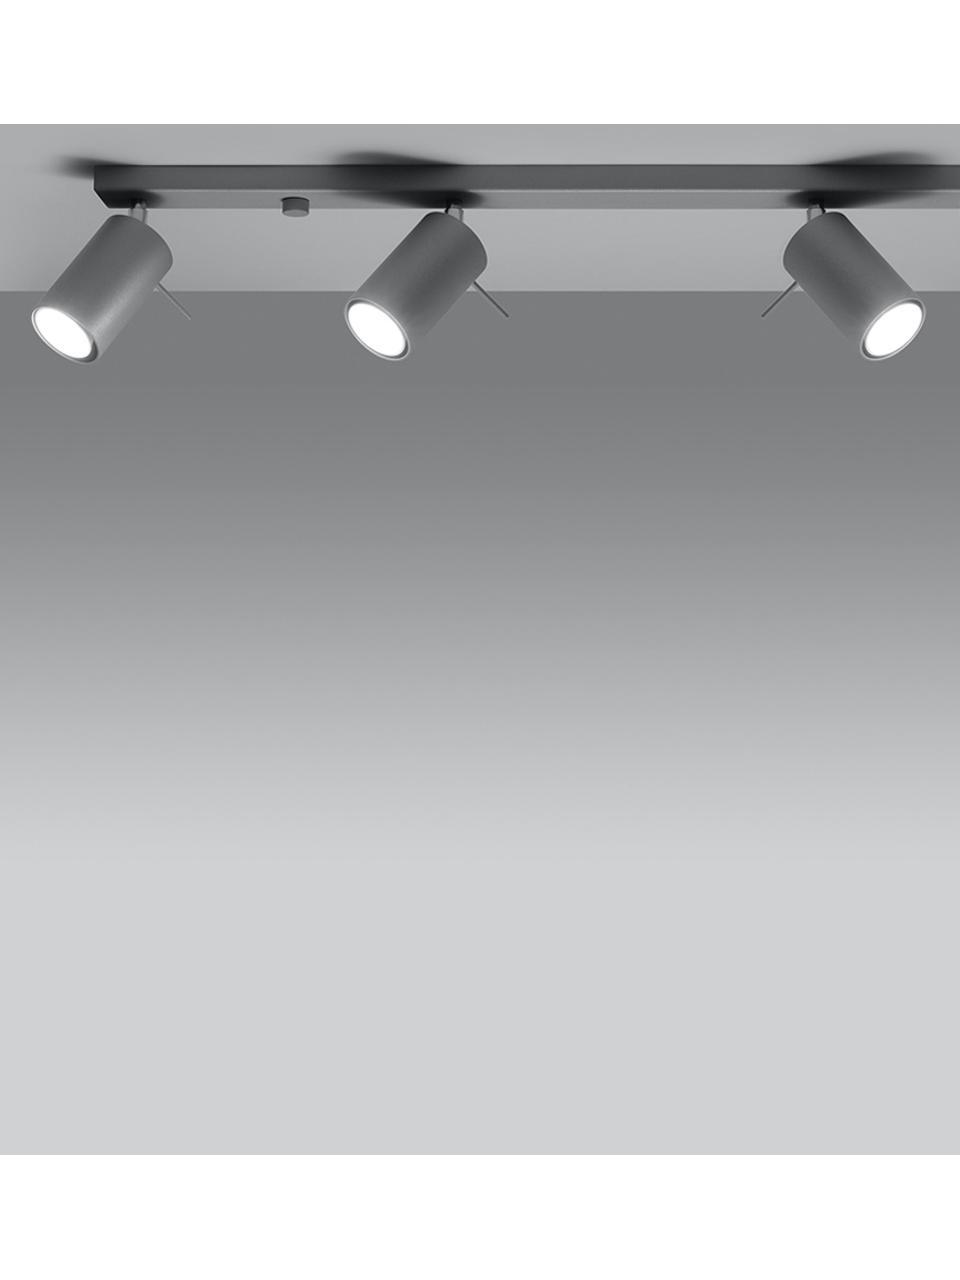 Deckenstrahler Etna in Grau, Baldachin: Stahl, lackiert, Grau, 80 x 15 cm